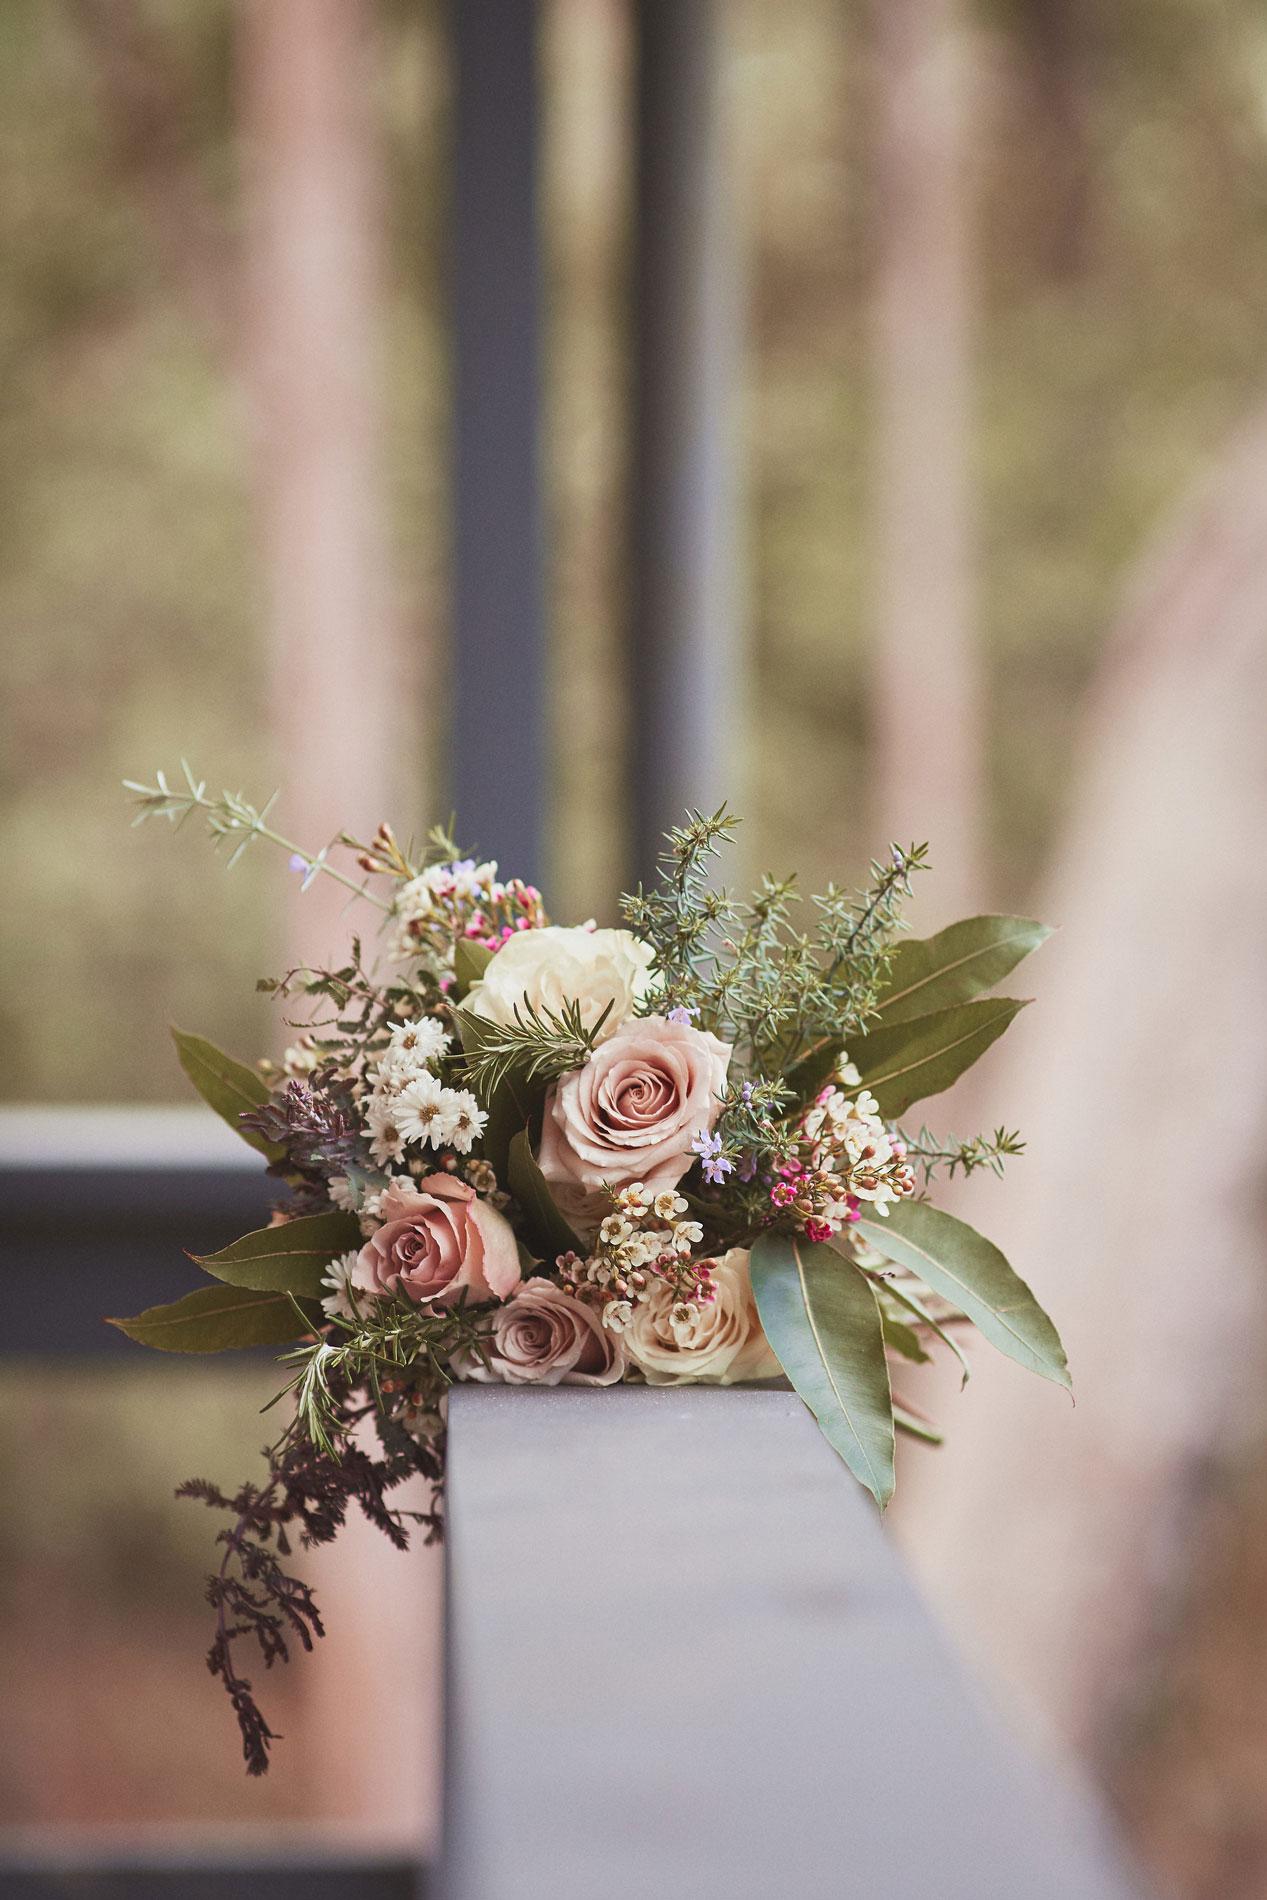 wedding_flowers_brooke_pierre4.jpg